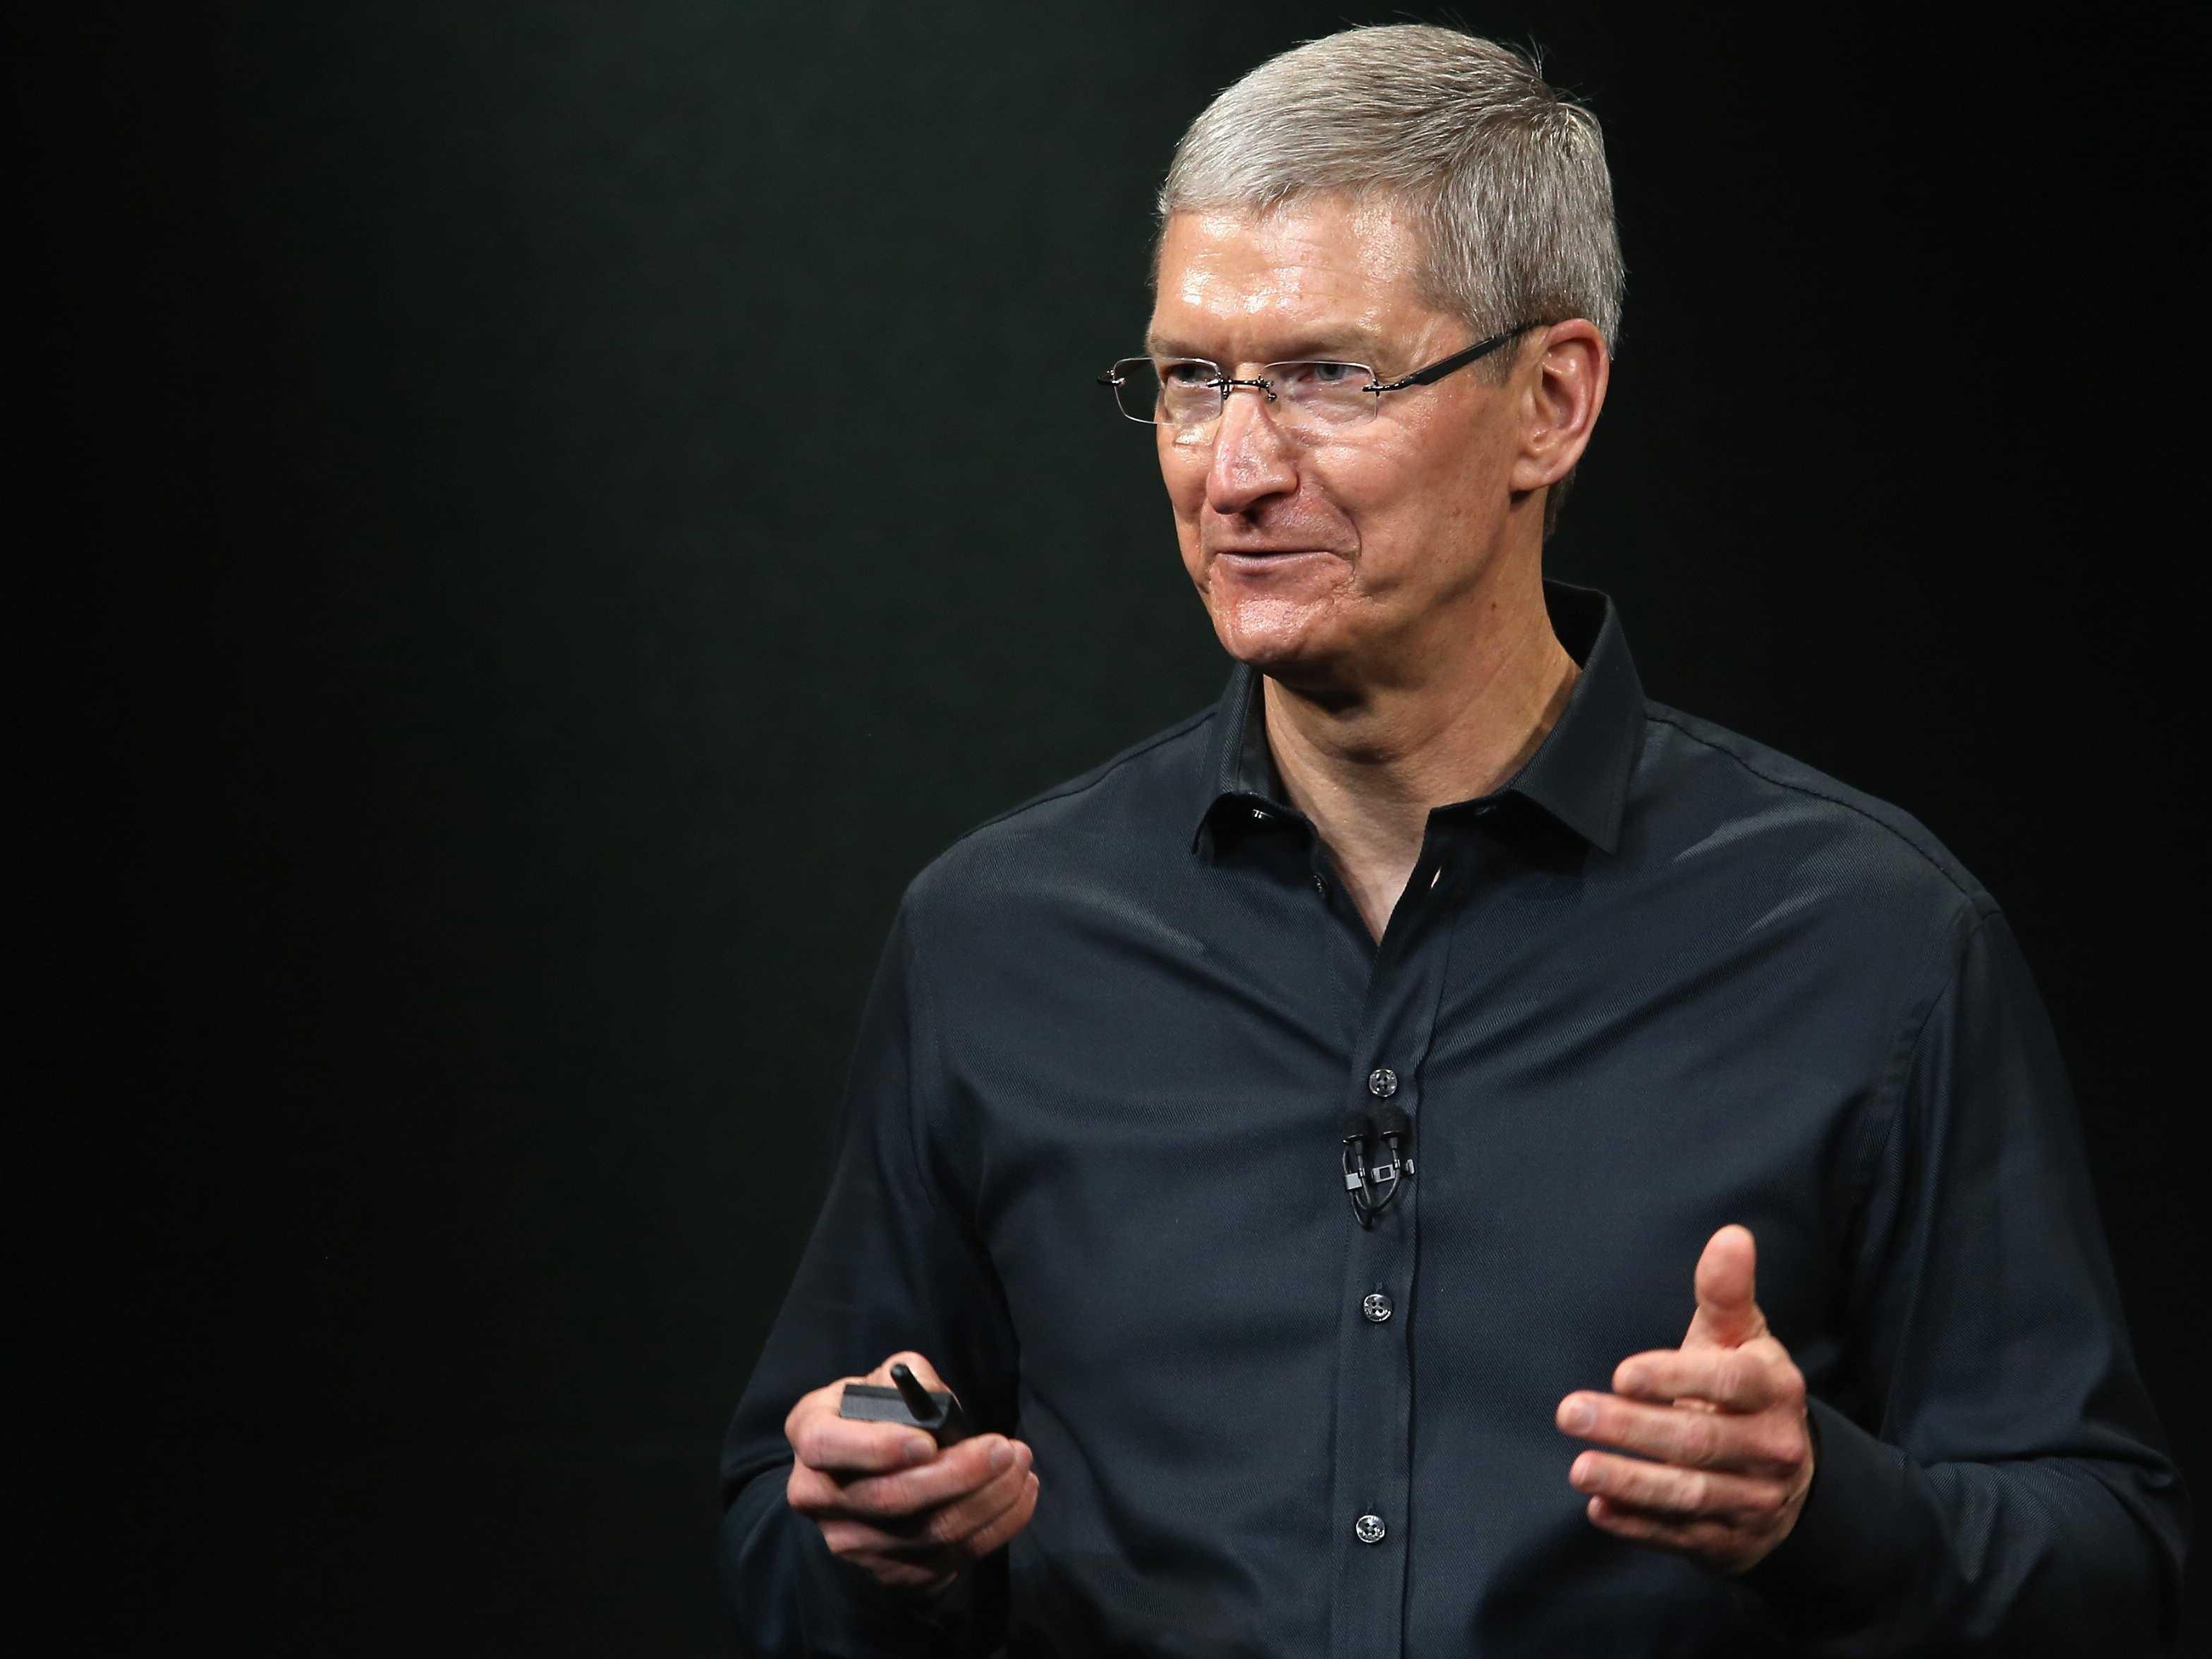 Гендиректор Apple Тім Кук зізнався у гомосексуальності